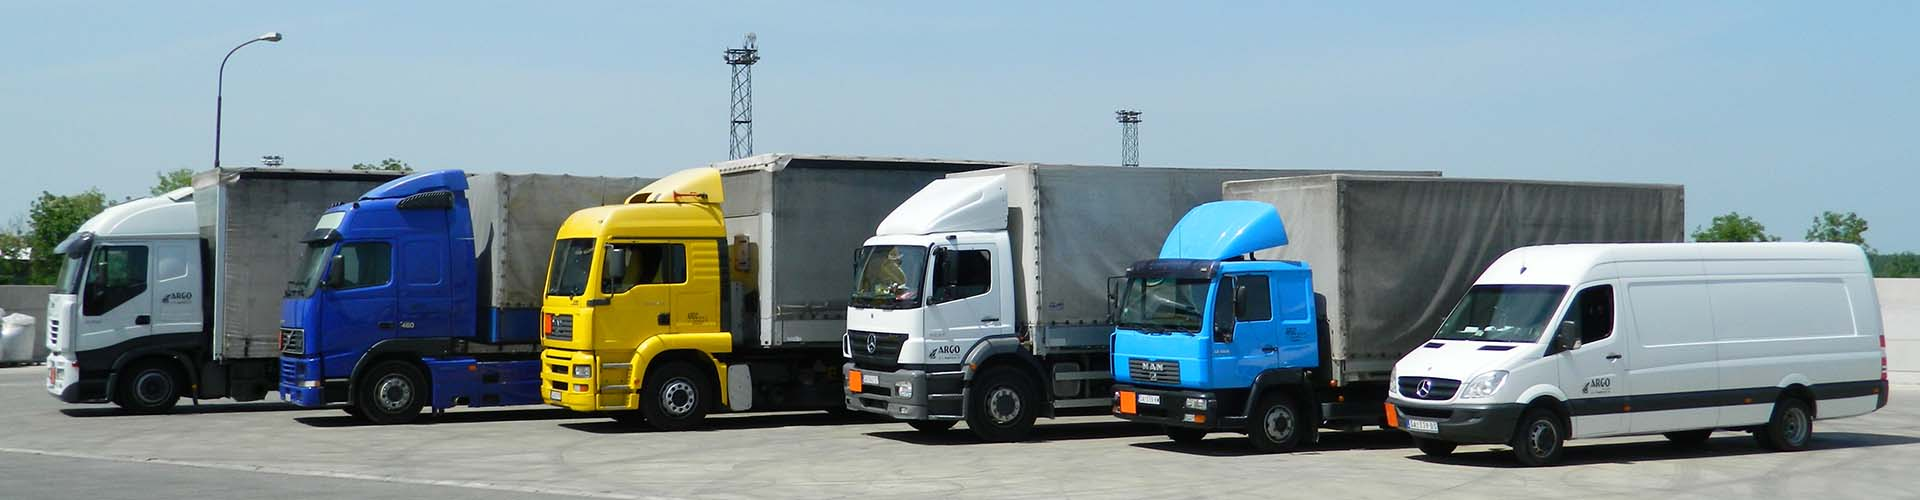 Argo transport